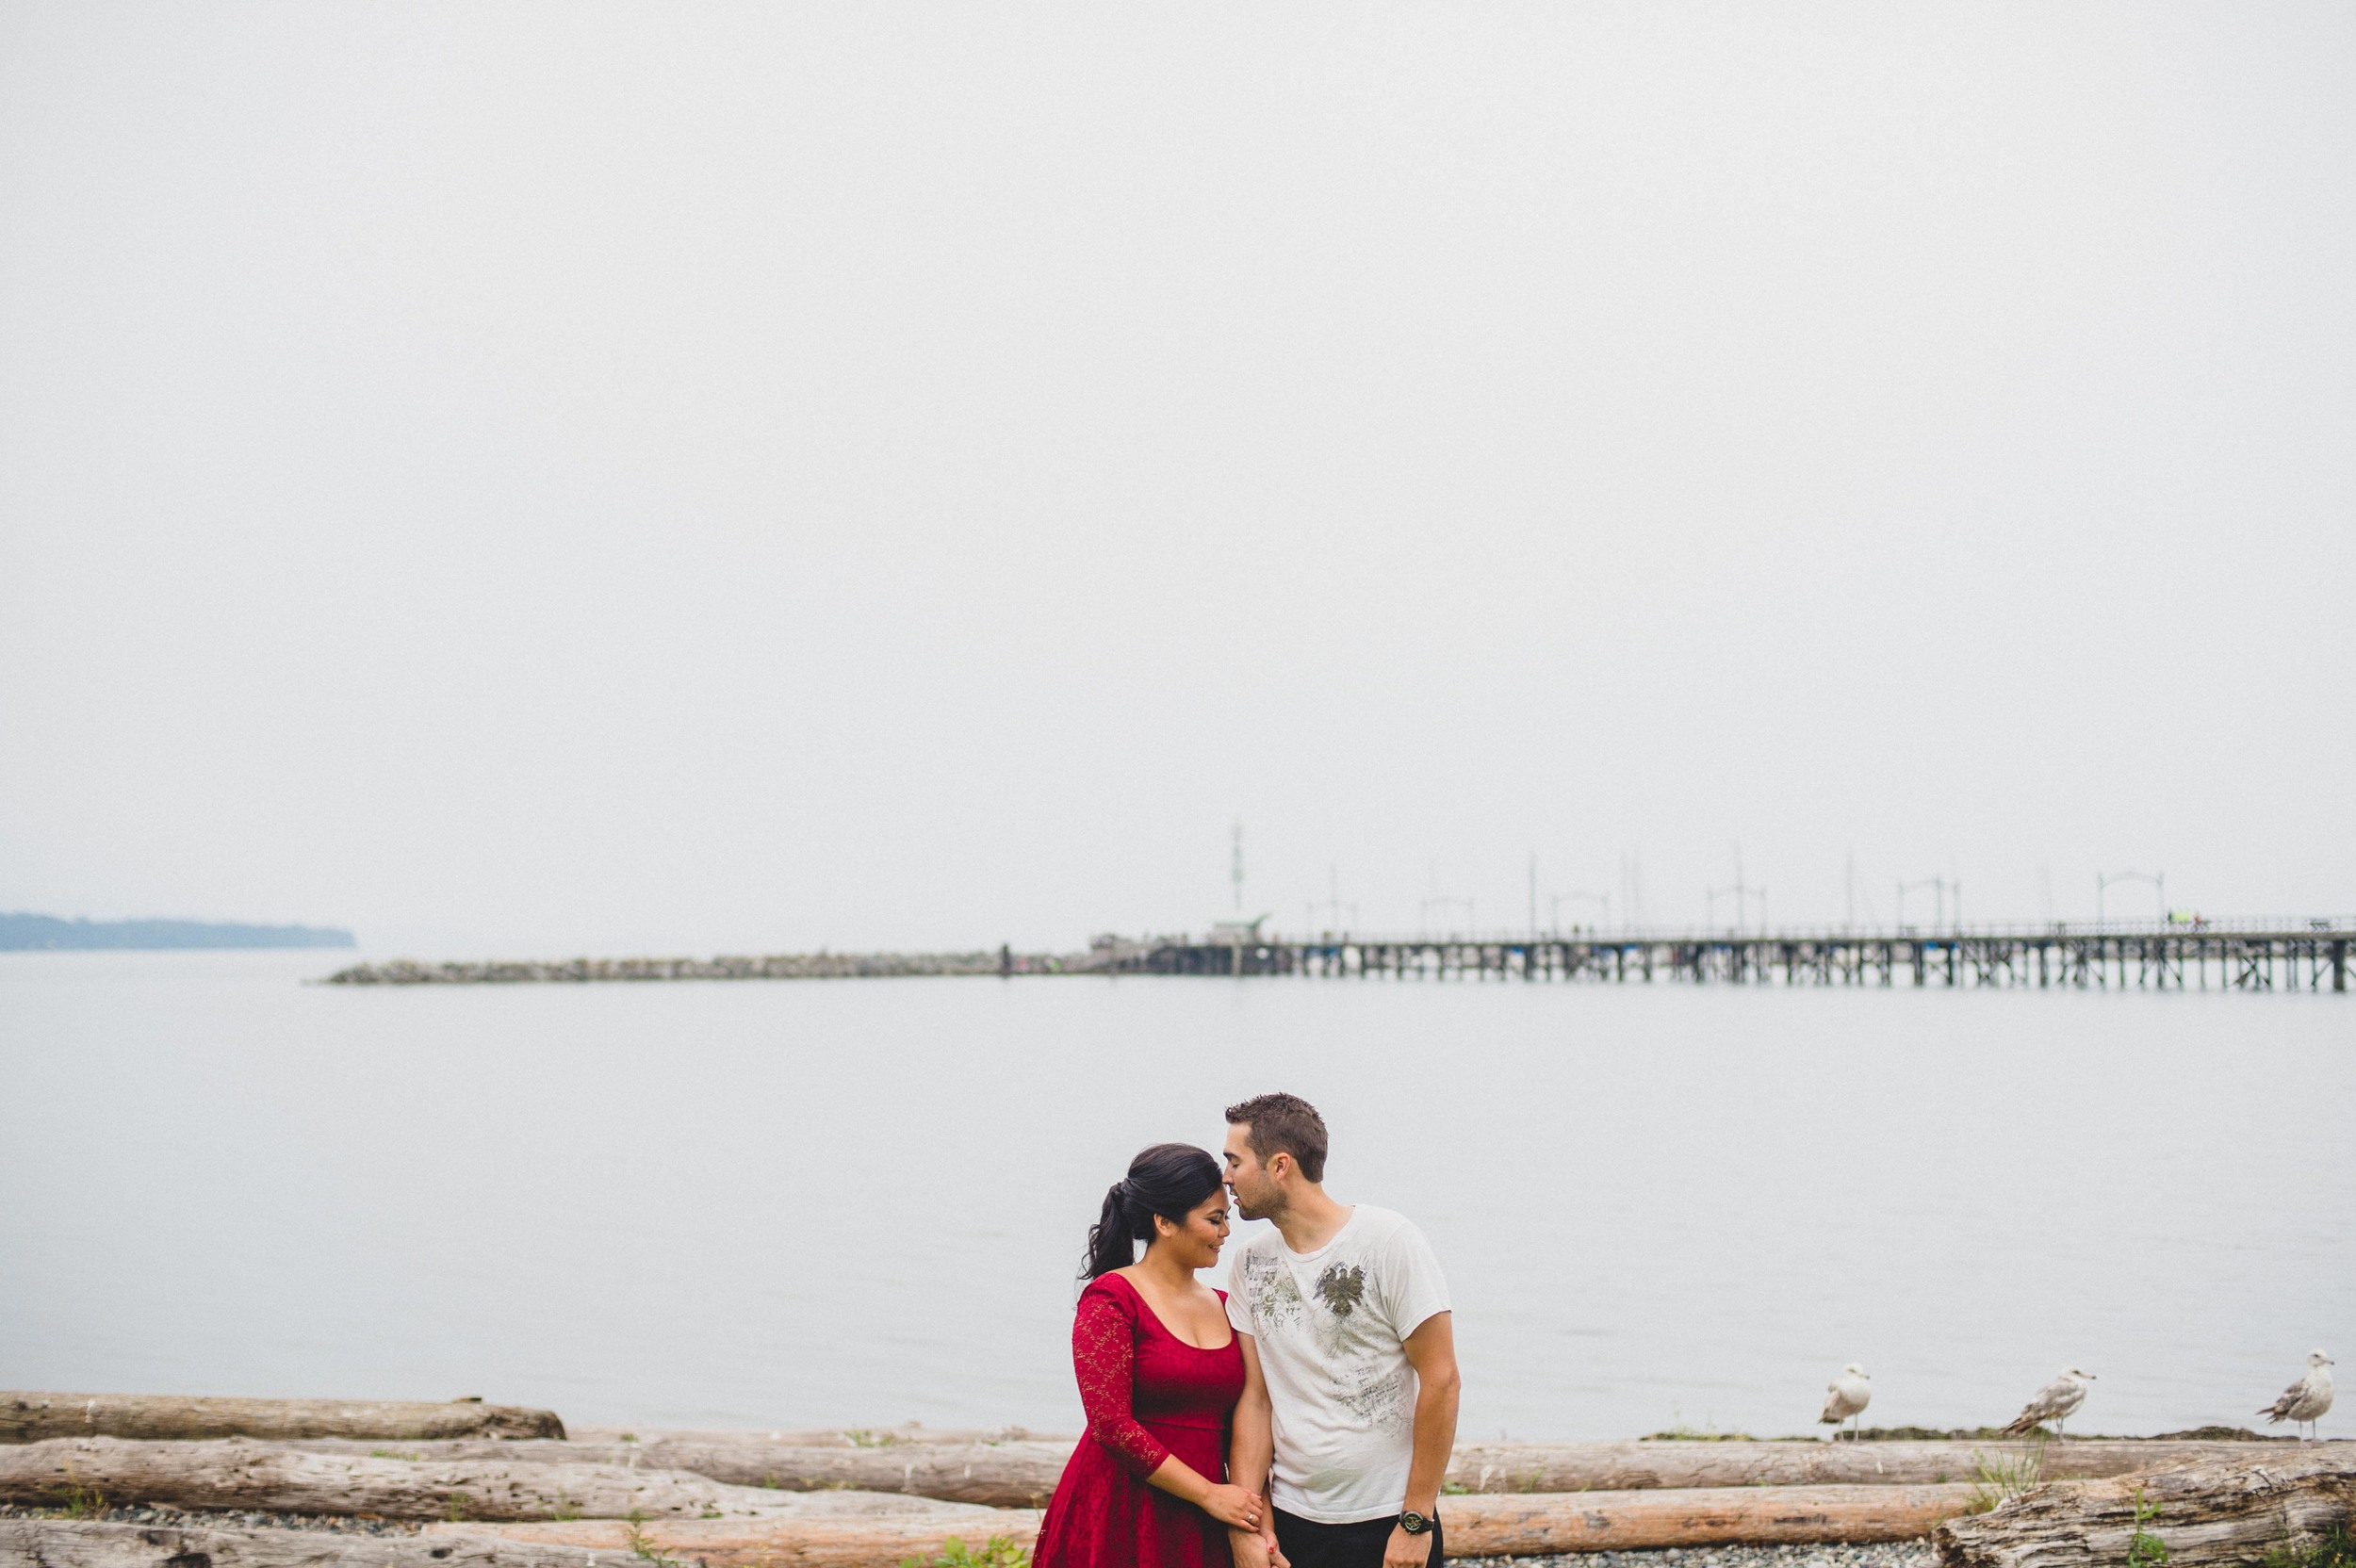 Vancouevr wedding photography edward lai photogrpaher -12.jpg